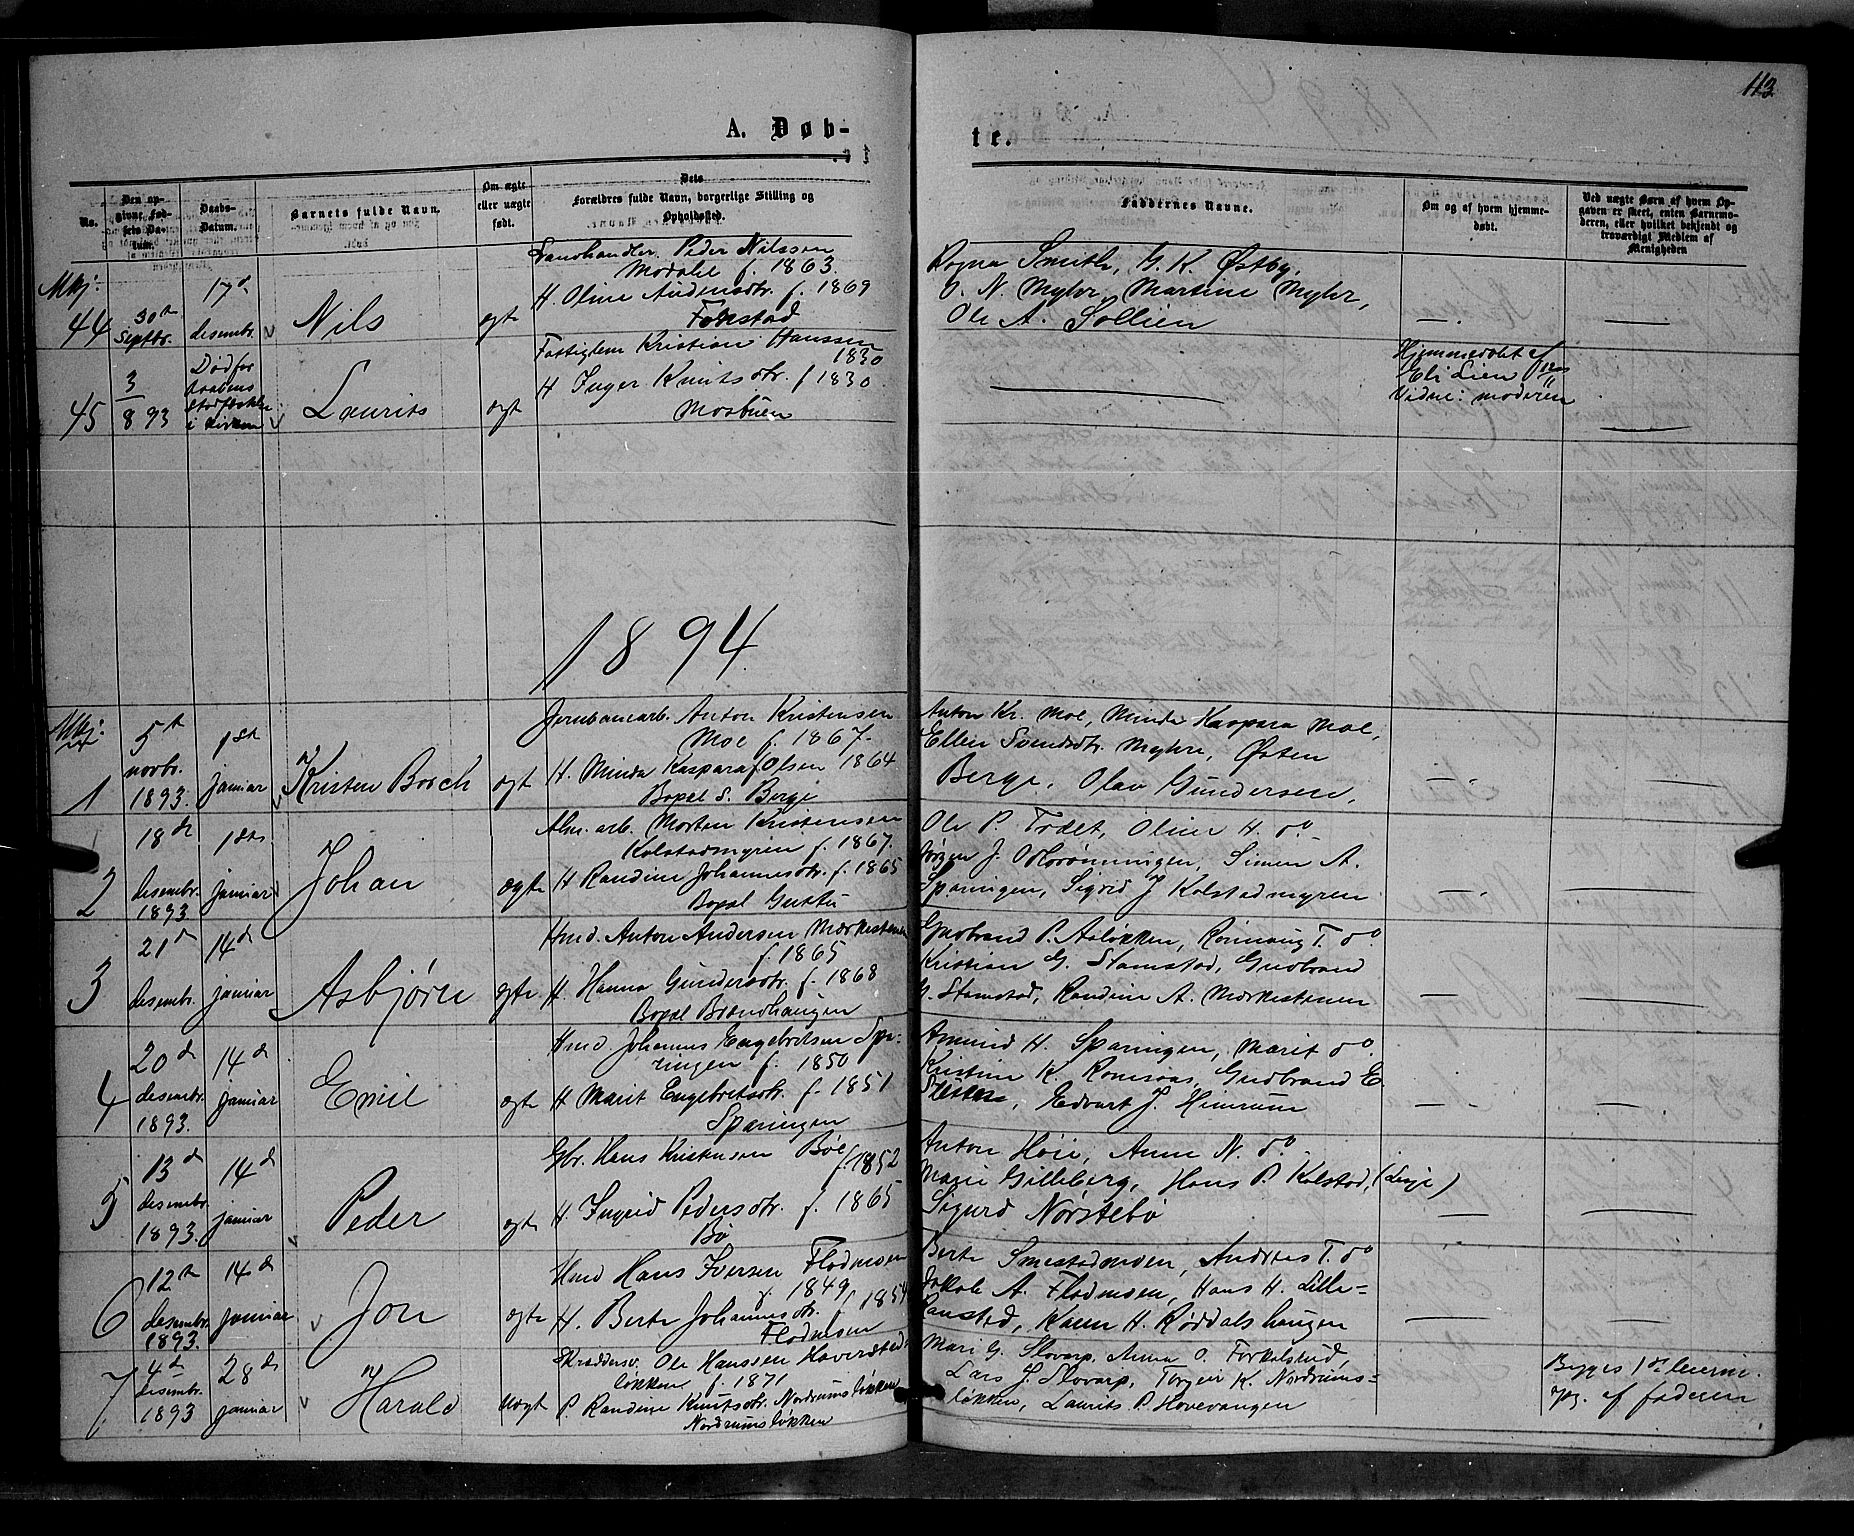 SAH, Ringebu prestekontor, Klokkerbok nr. 6, 1880-1898, s. 113